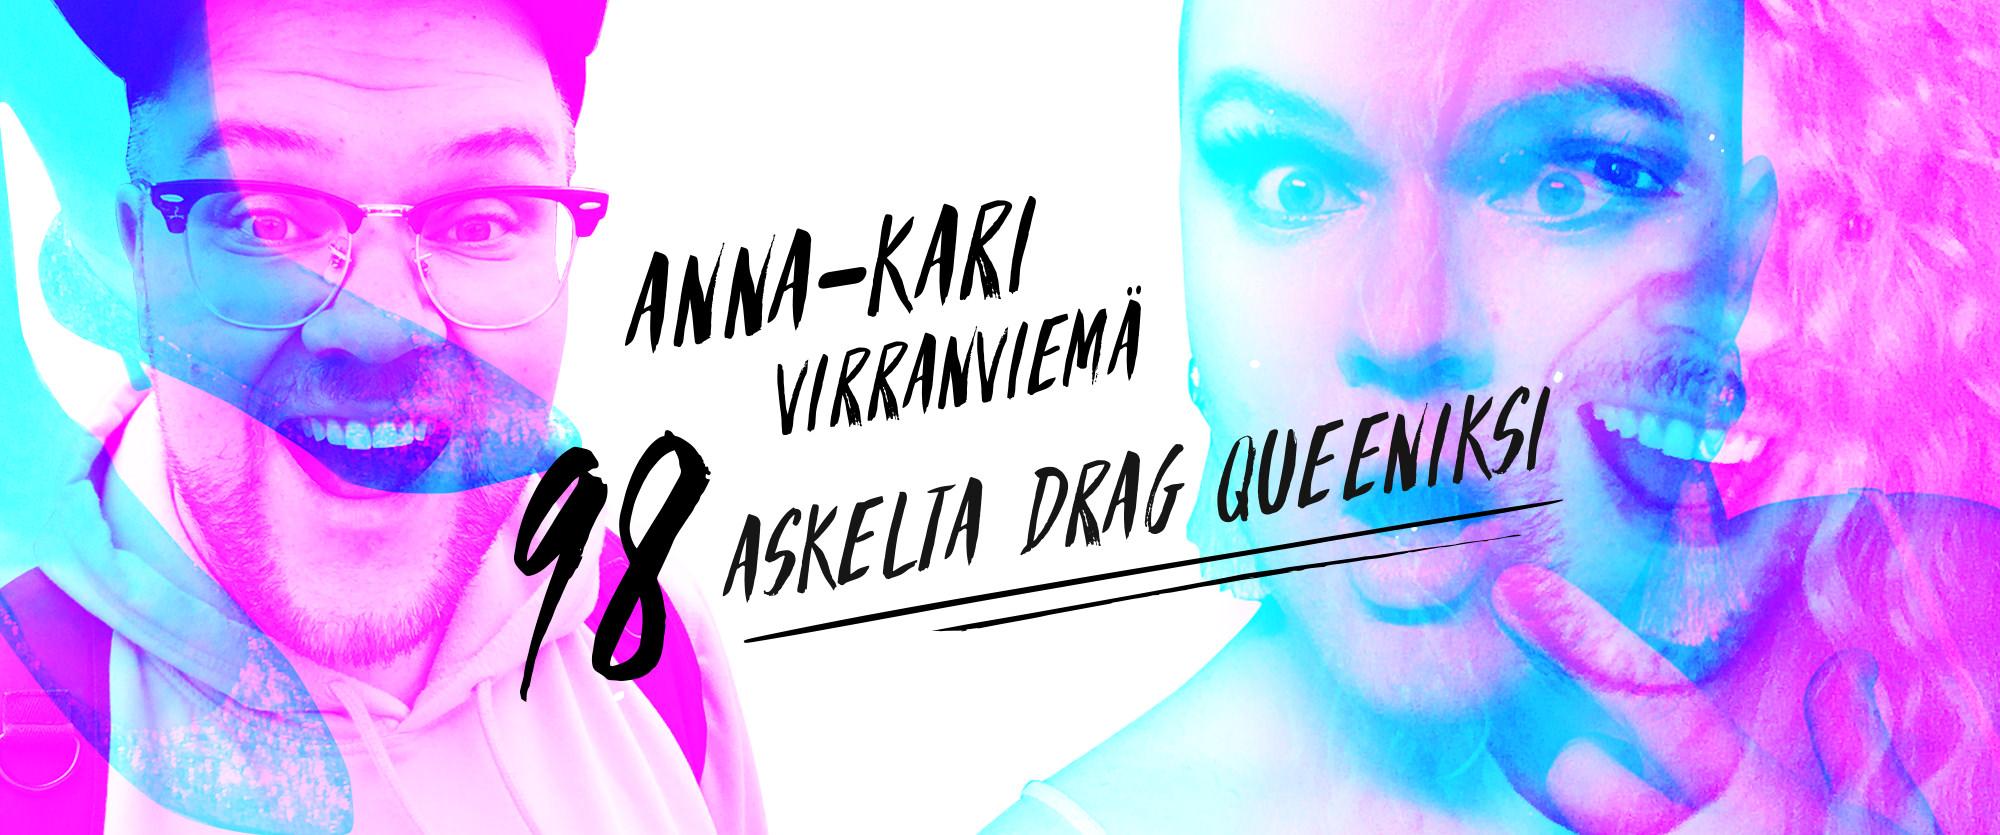 Anna-Kari Virranviemä – 98 askelta drag queeniksi